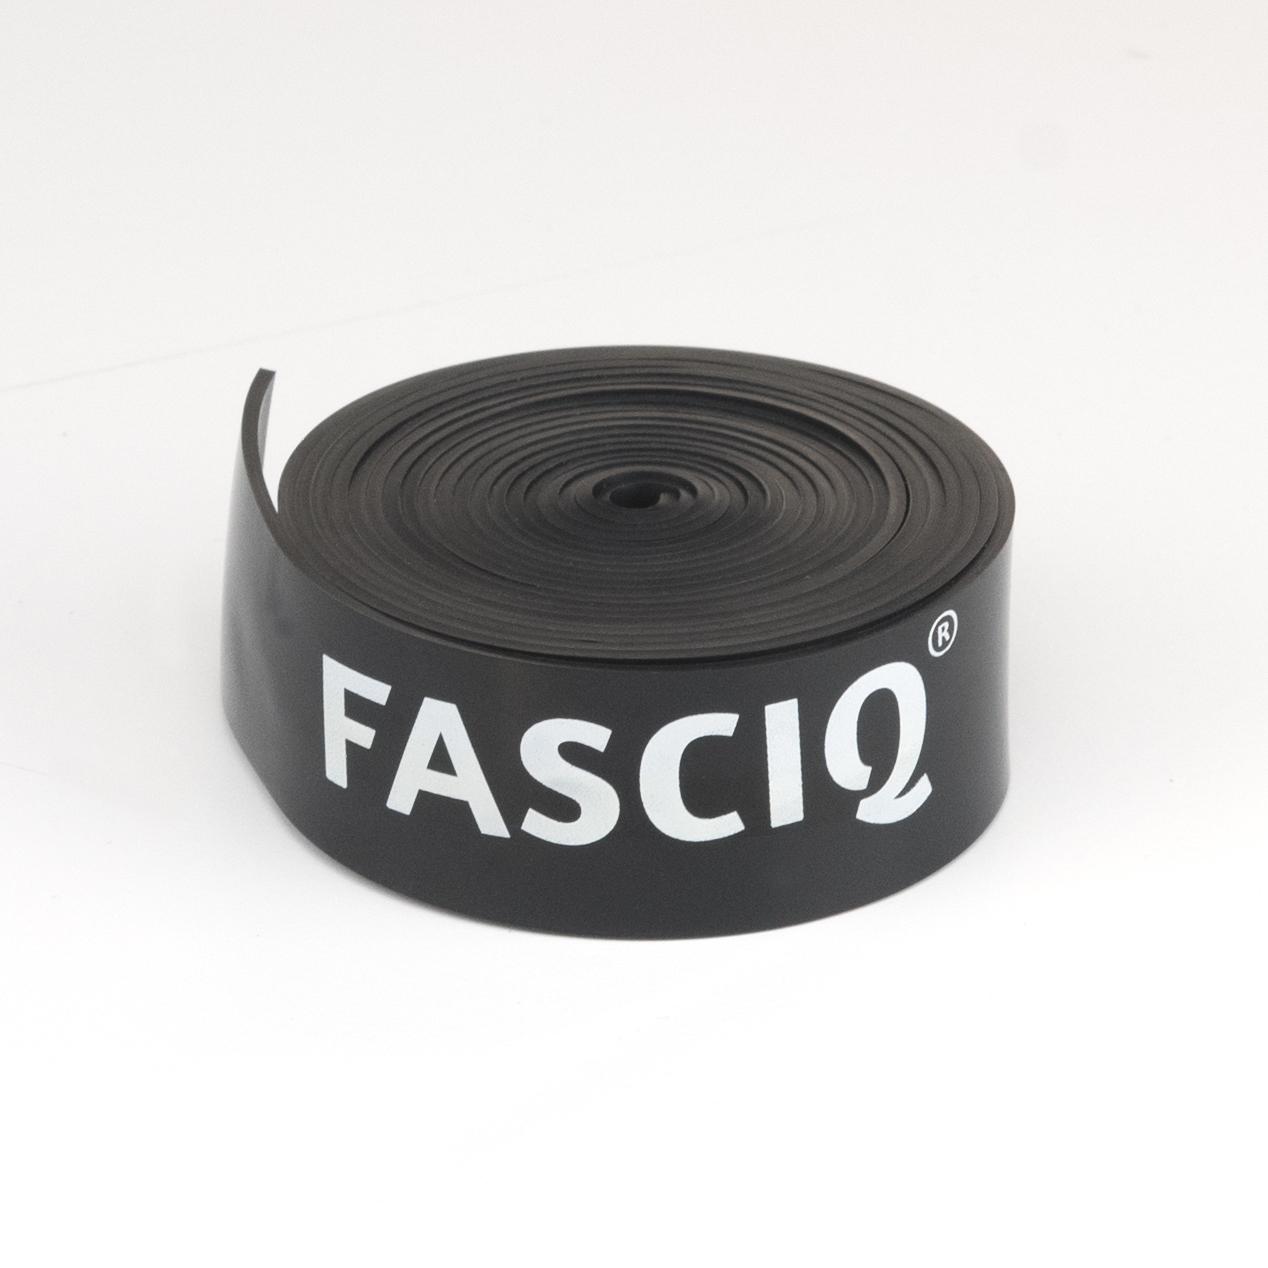 fasciq-flossbanden-2-5cm-1-5mm